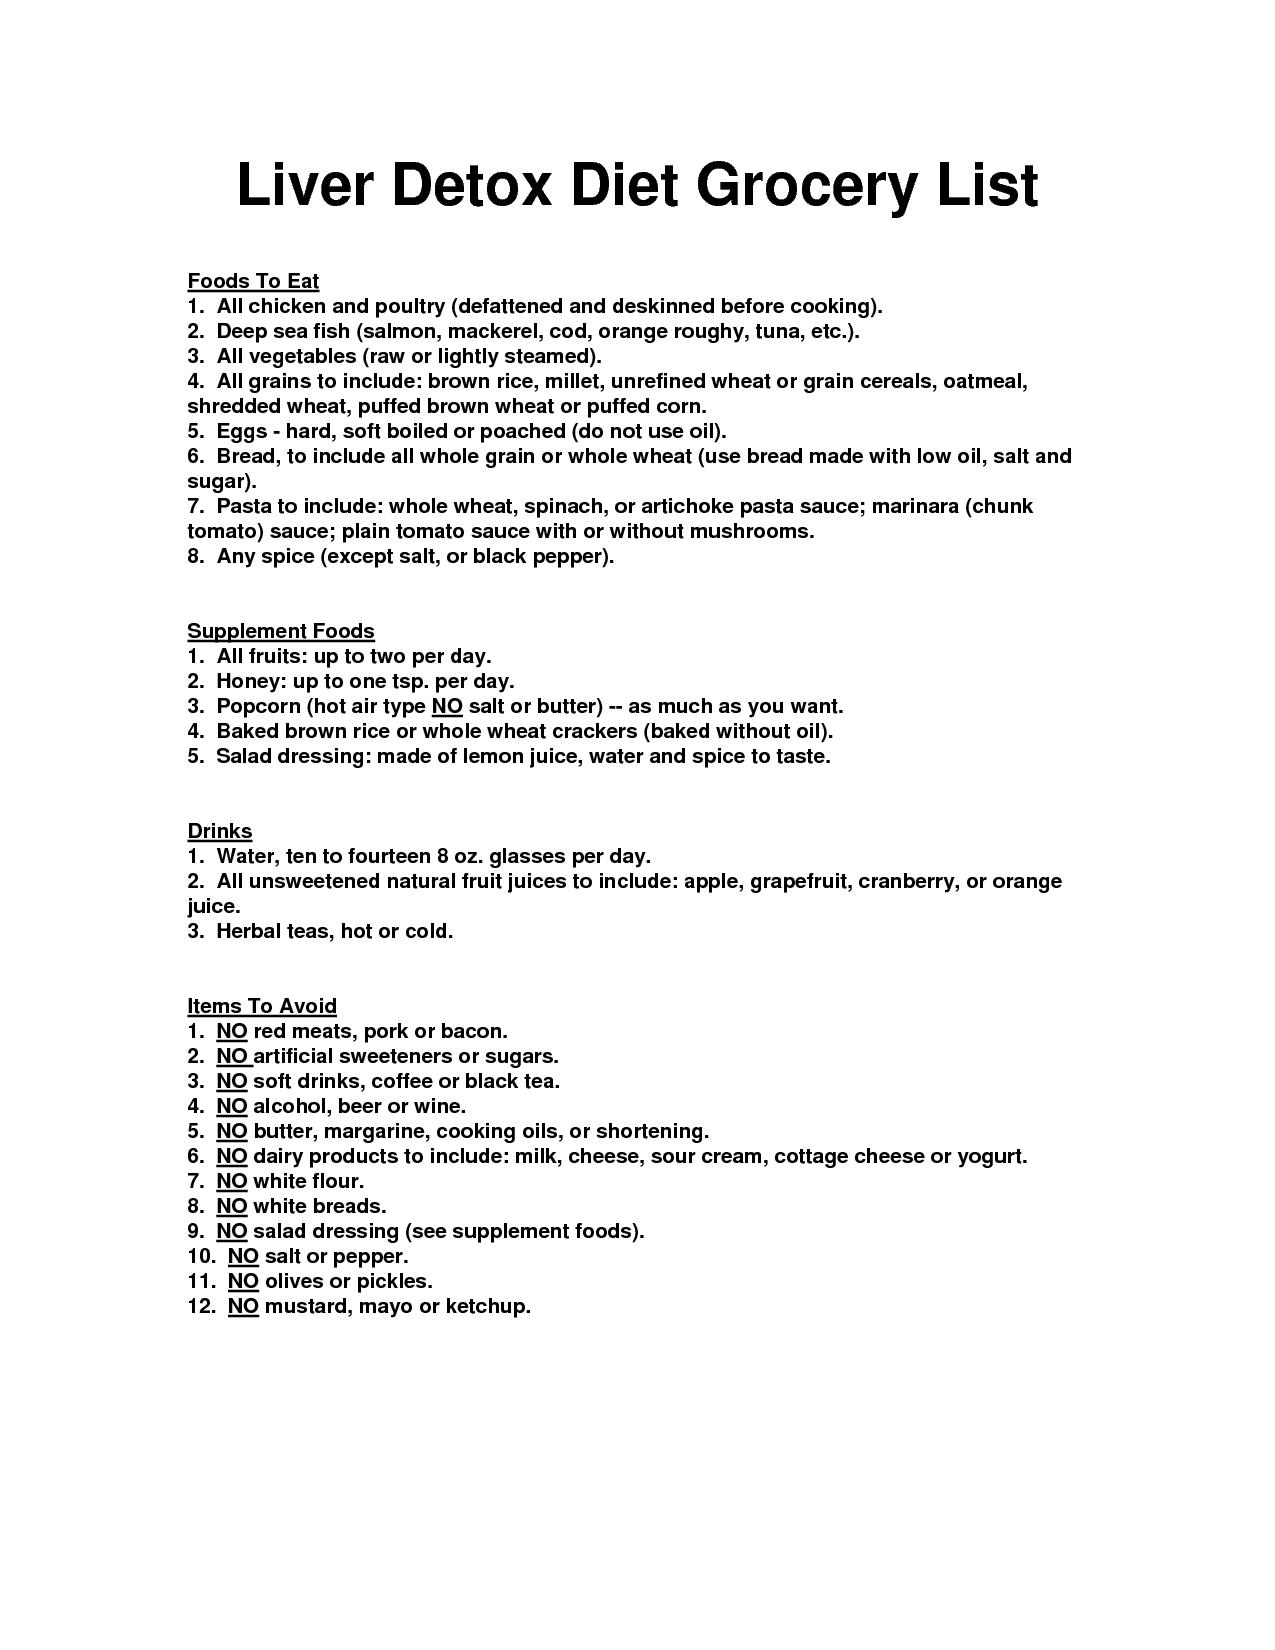 fatty liver diet grocery list